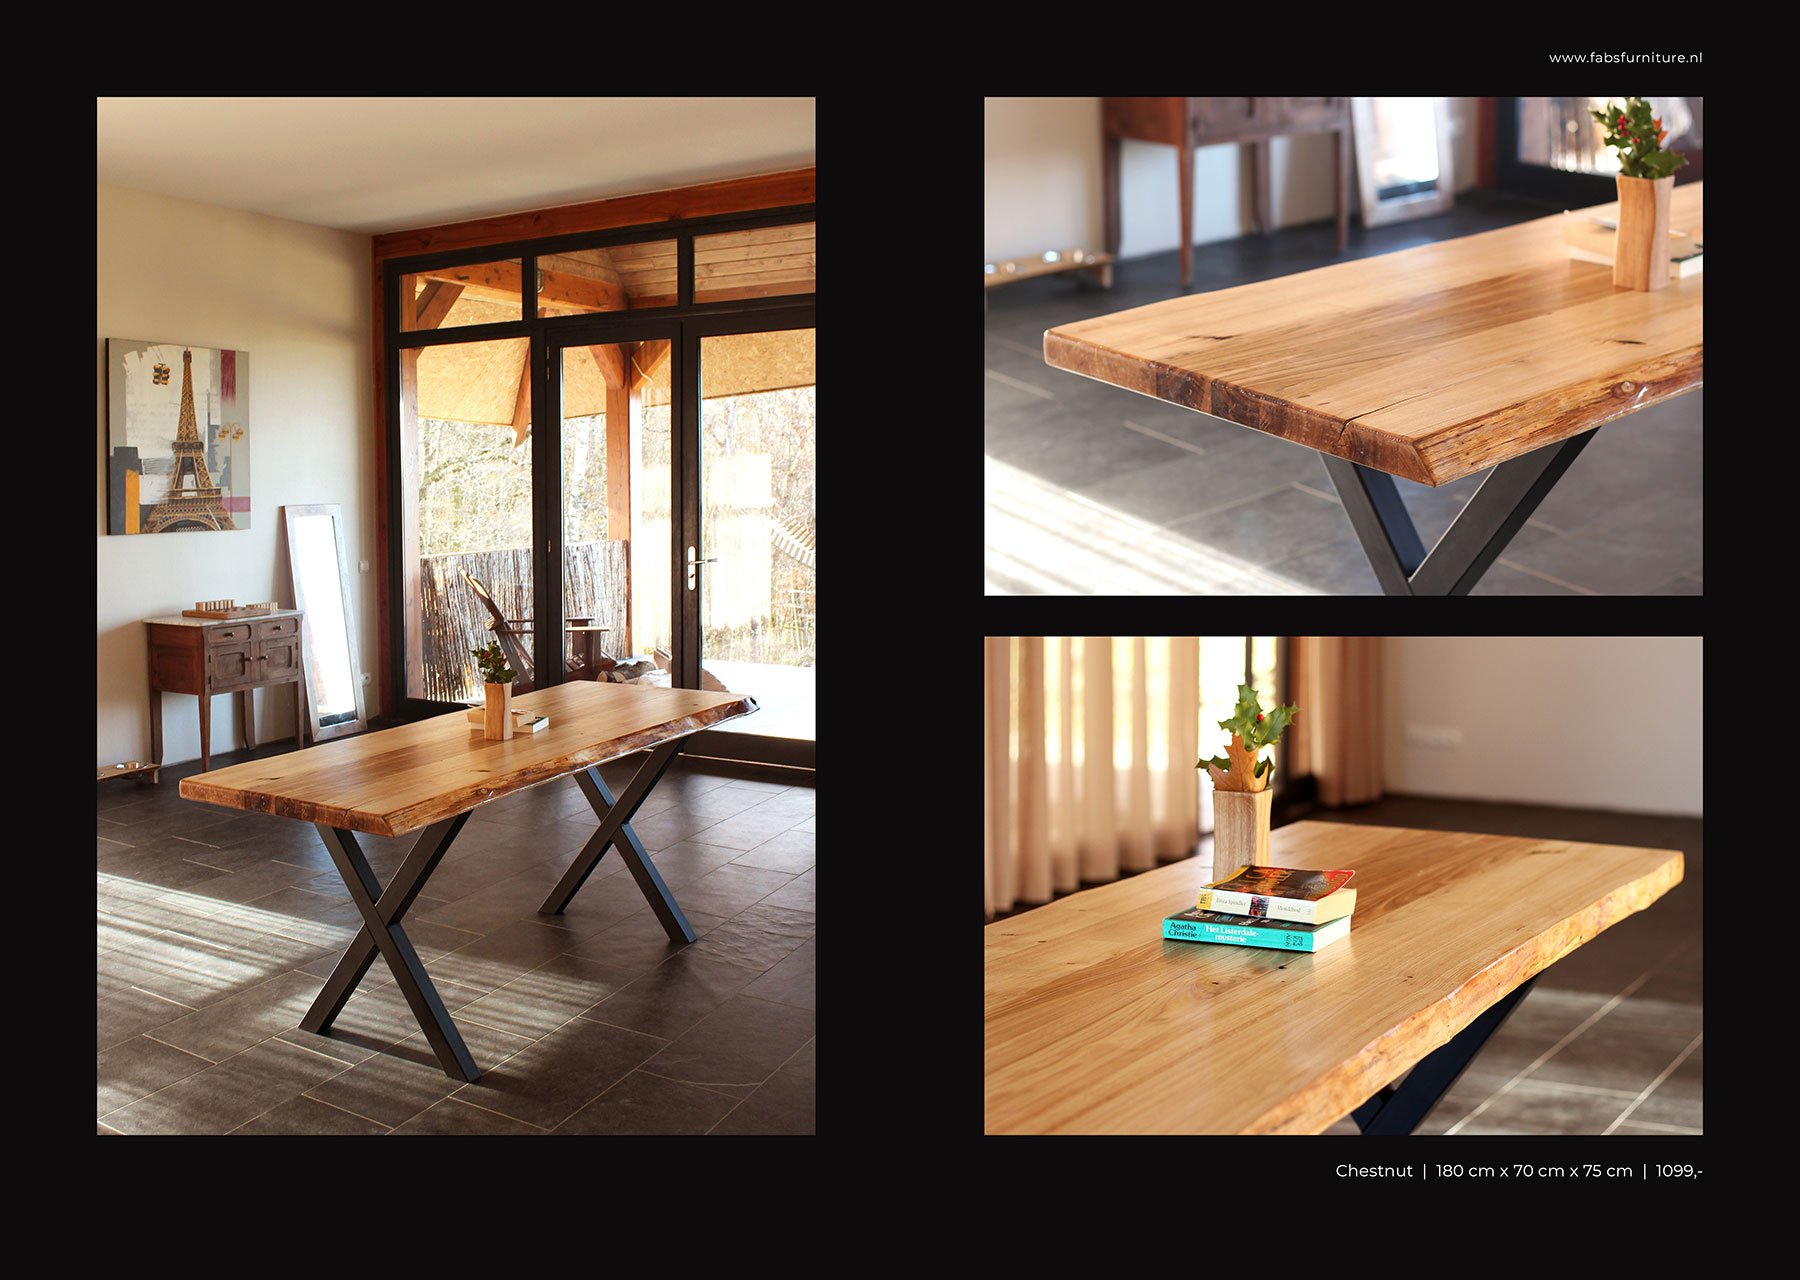 FabsFurniture Europe Portfolio - 2021 - wood dining table